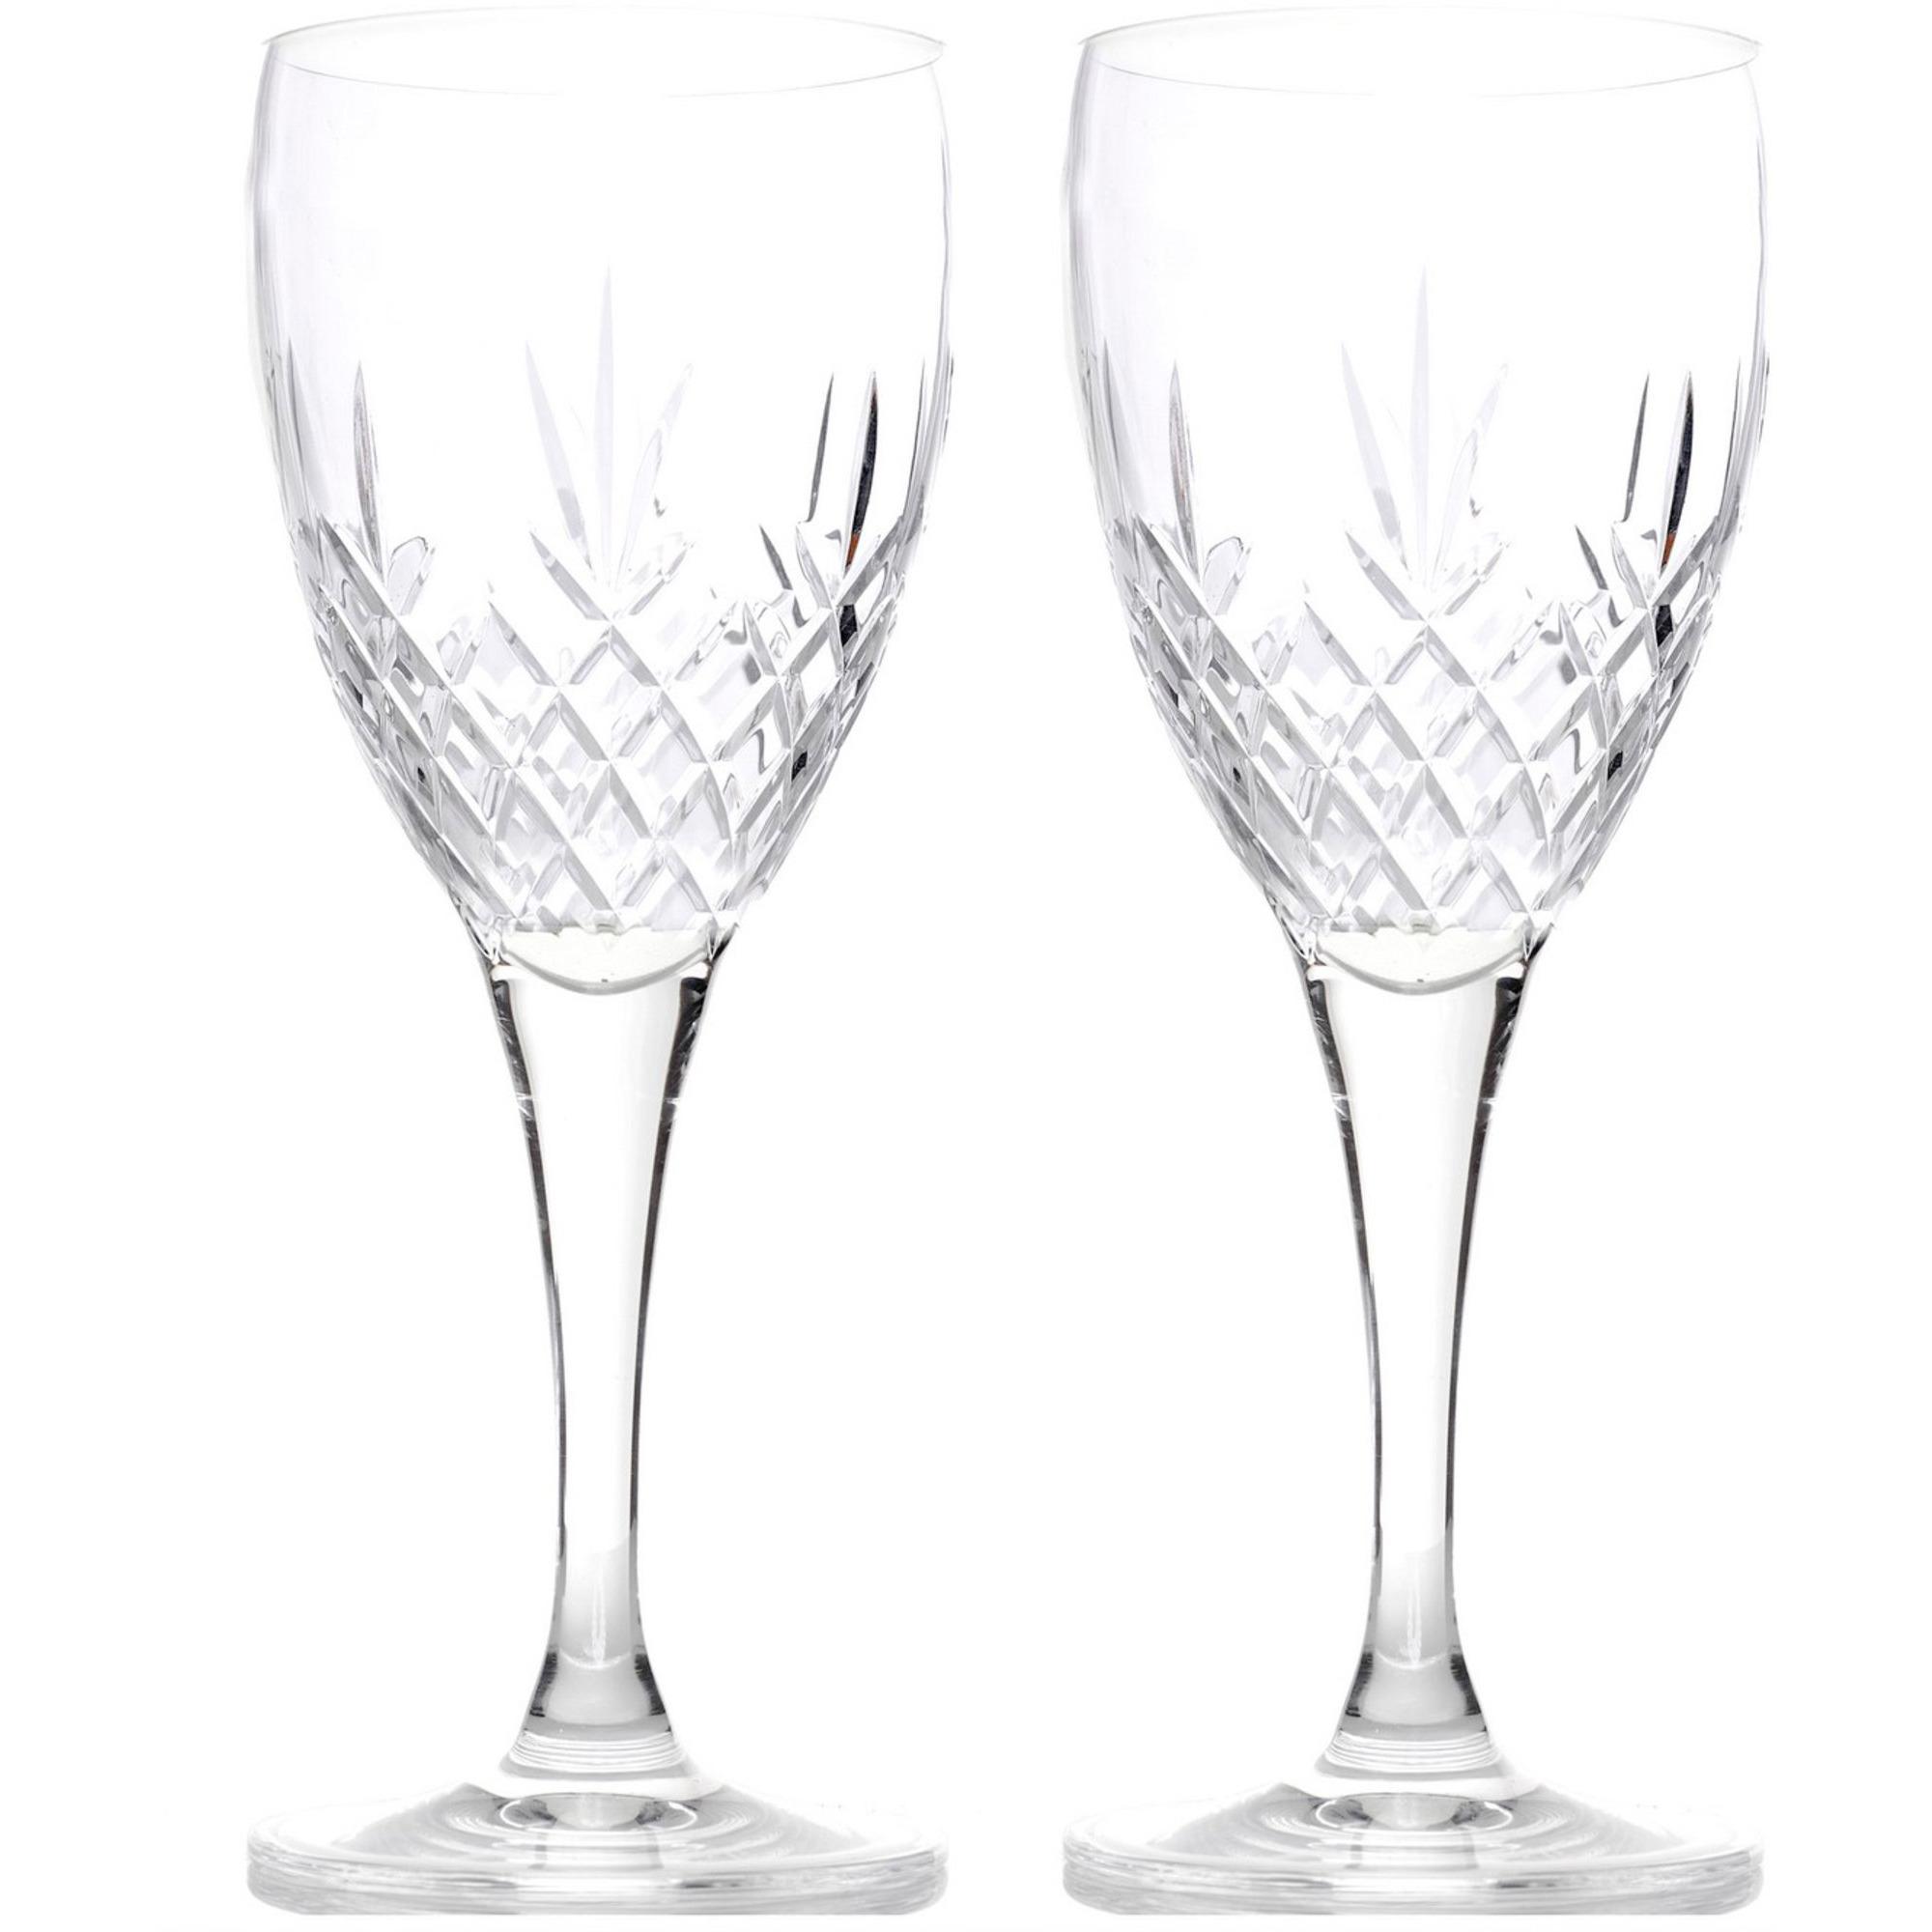 Frederik Bagger Crispy vitvinsglas 2 st.